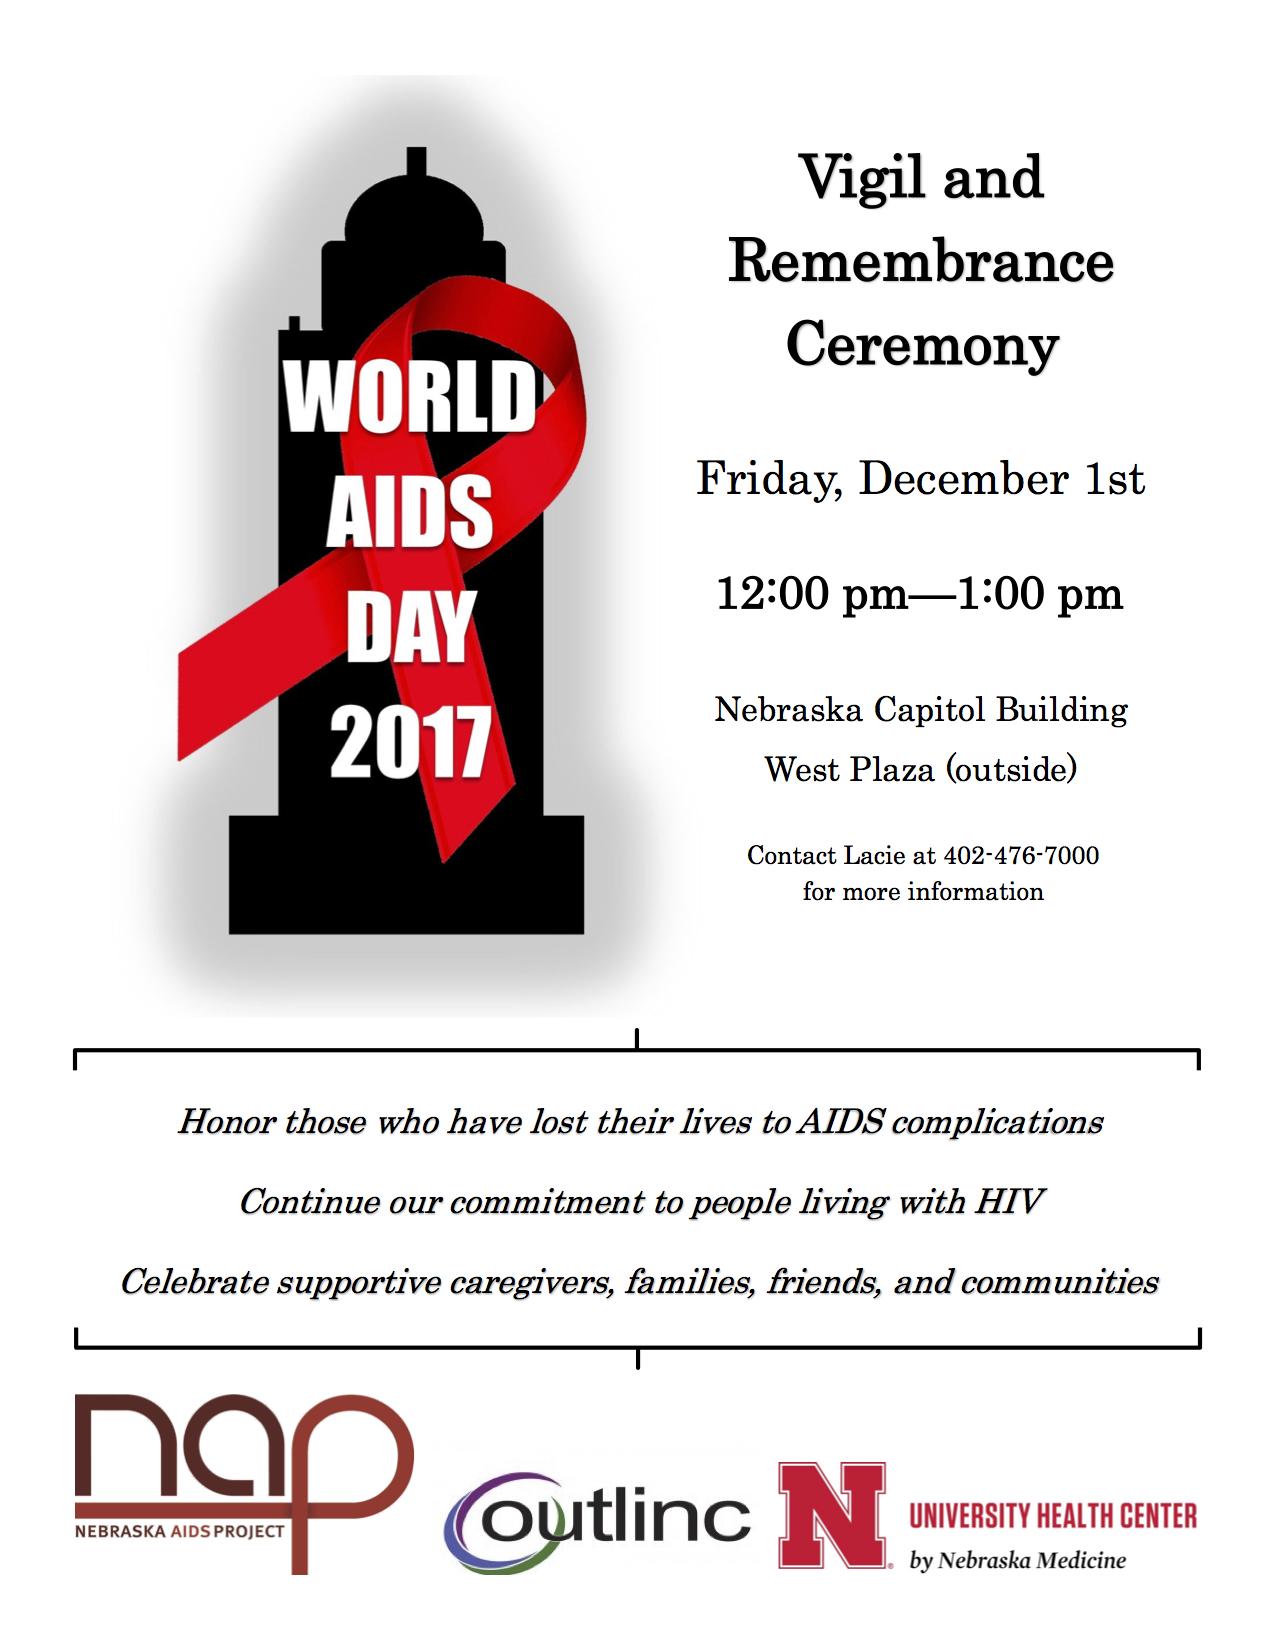 World Aids Day 2017 Vigil & Remembrance Ceremony